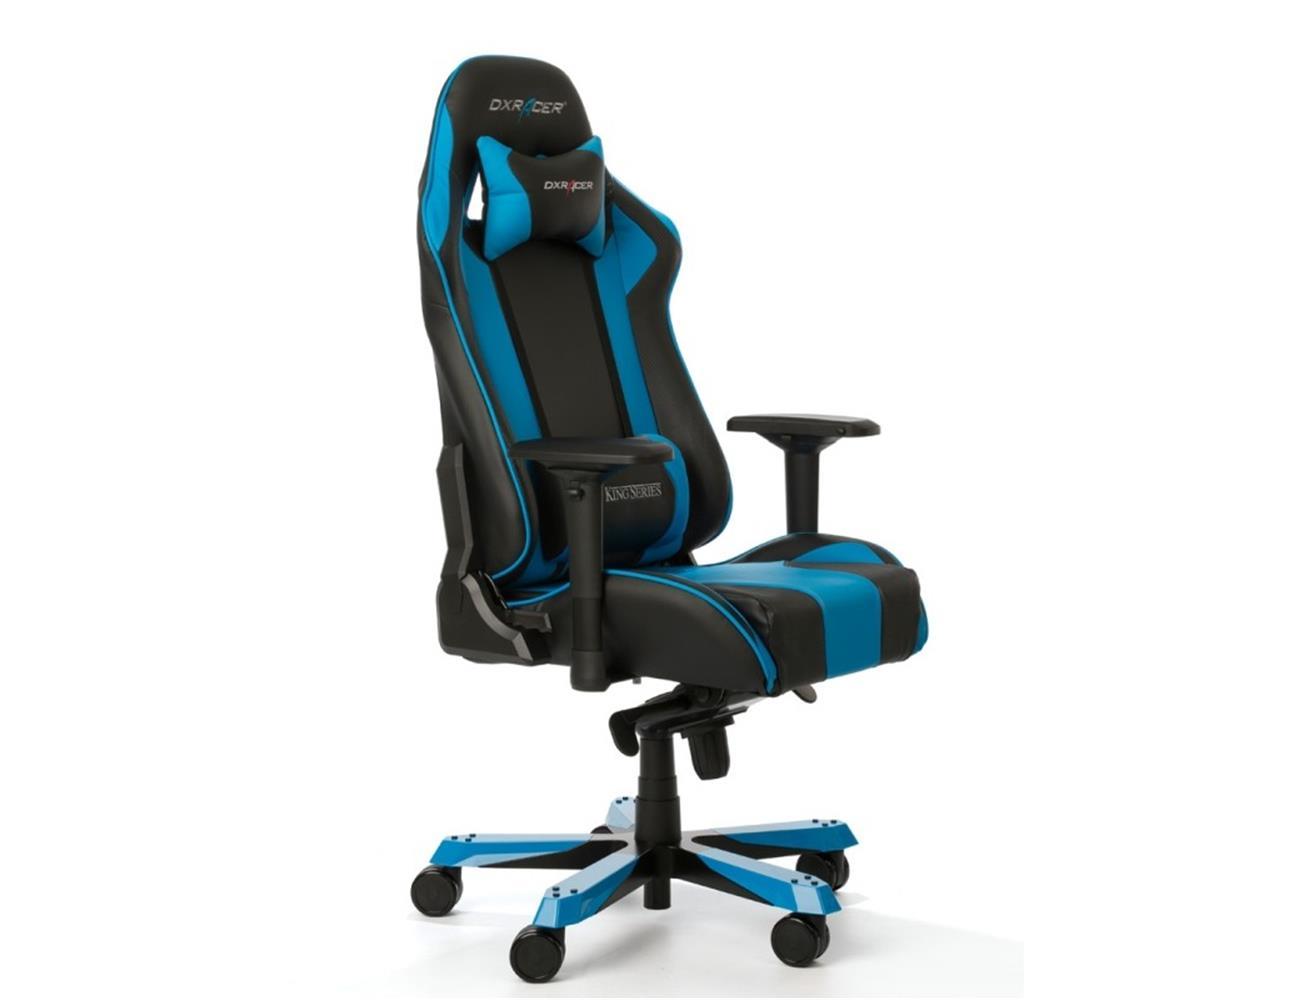 DXRacer King Series Gaming Chair - Black/Blue| Blink Kuwait